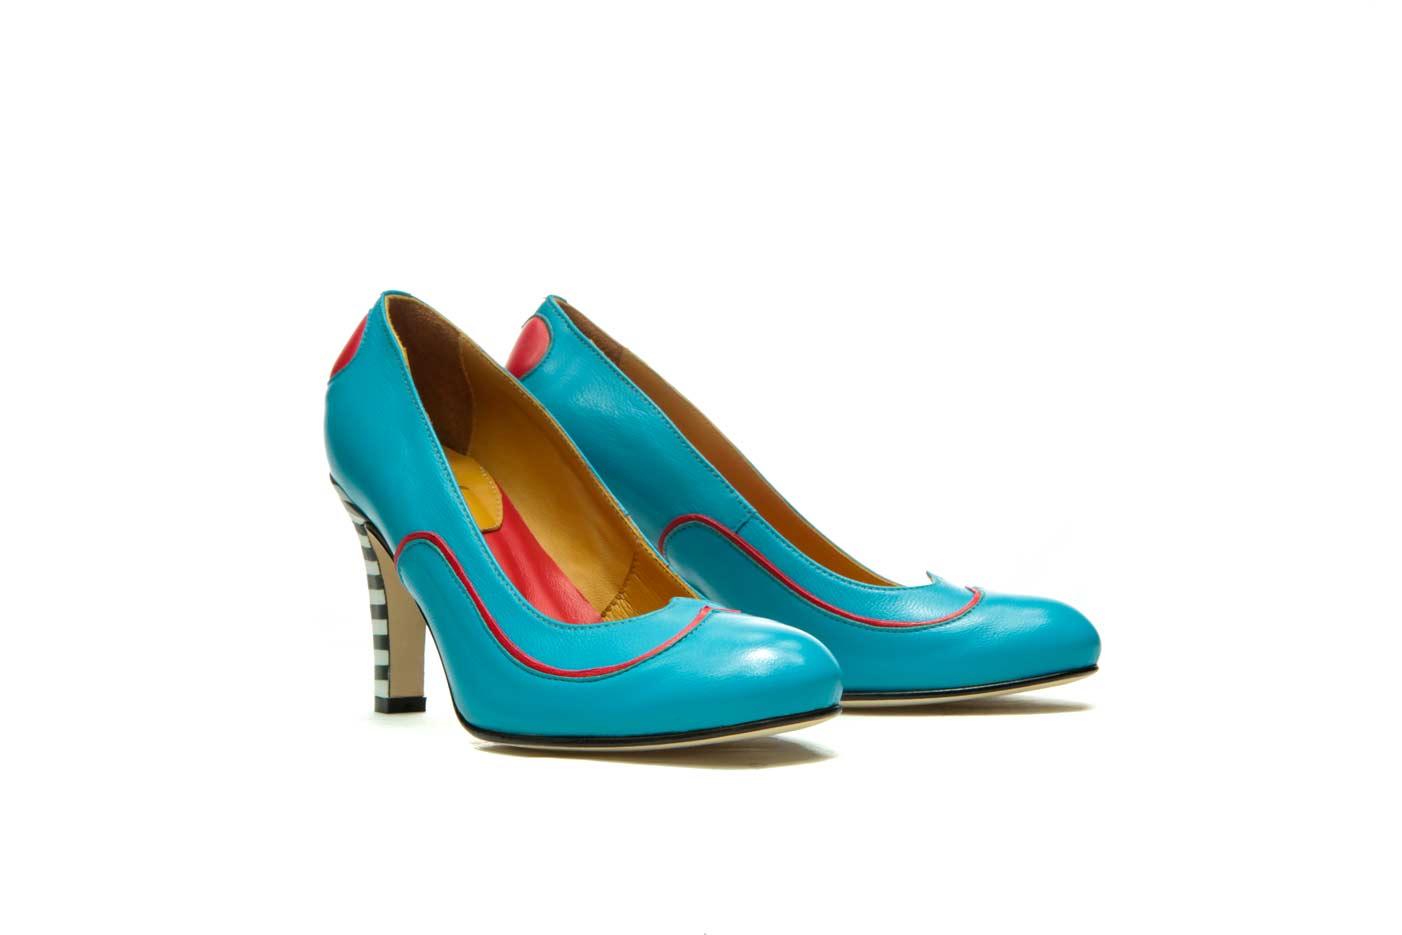 Blue heels | Official Milenika shoes